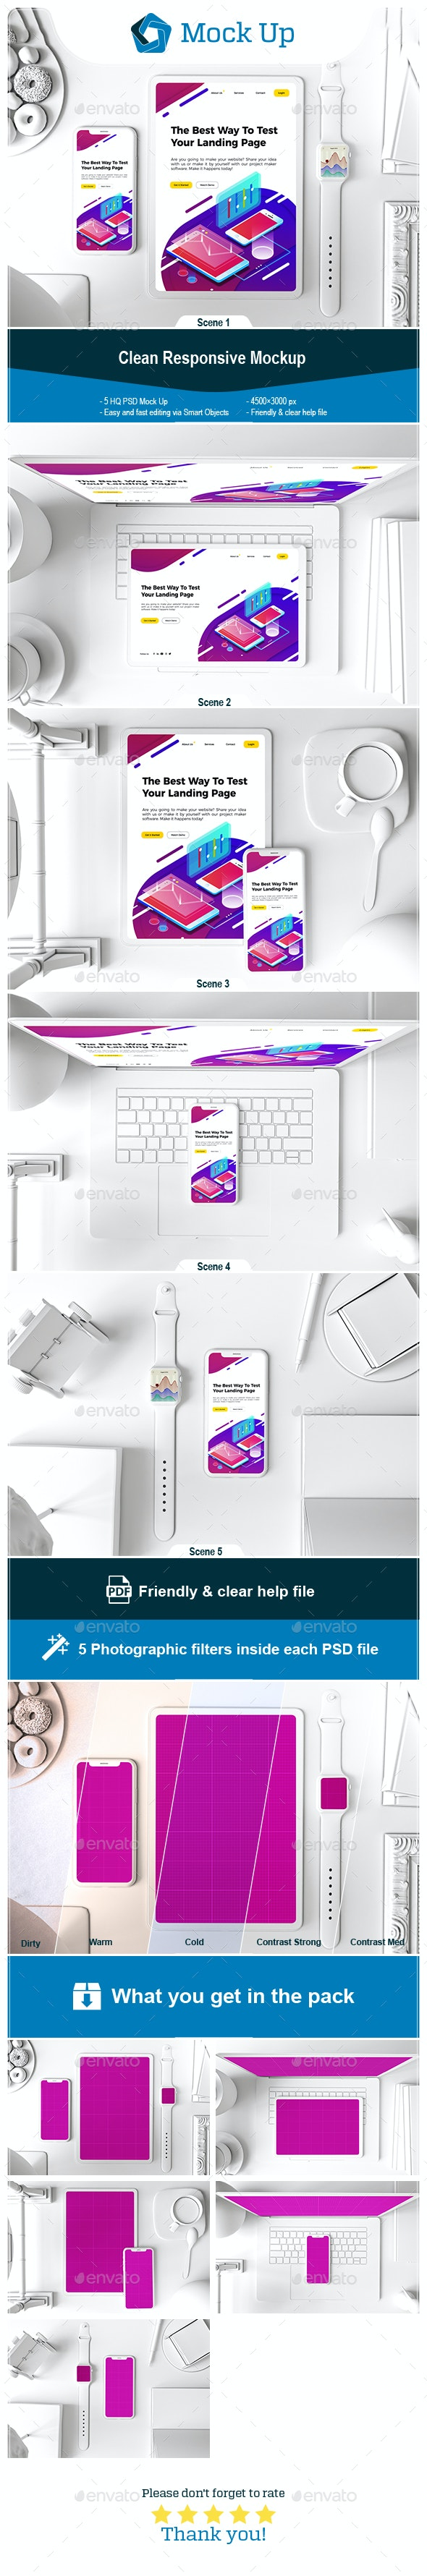 Clean Responsive - Displays Product Mock-Ups